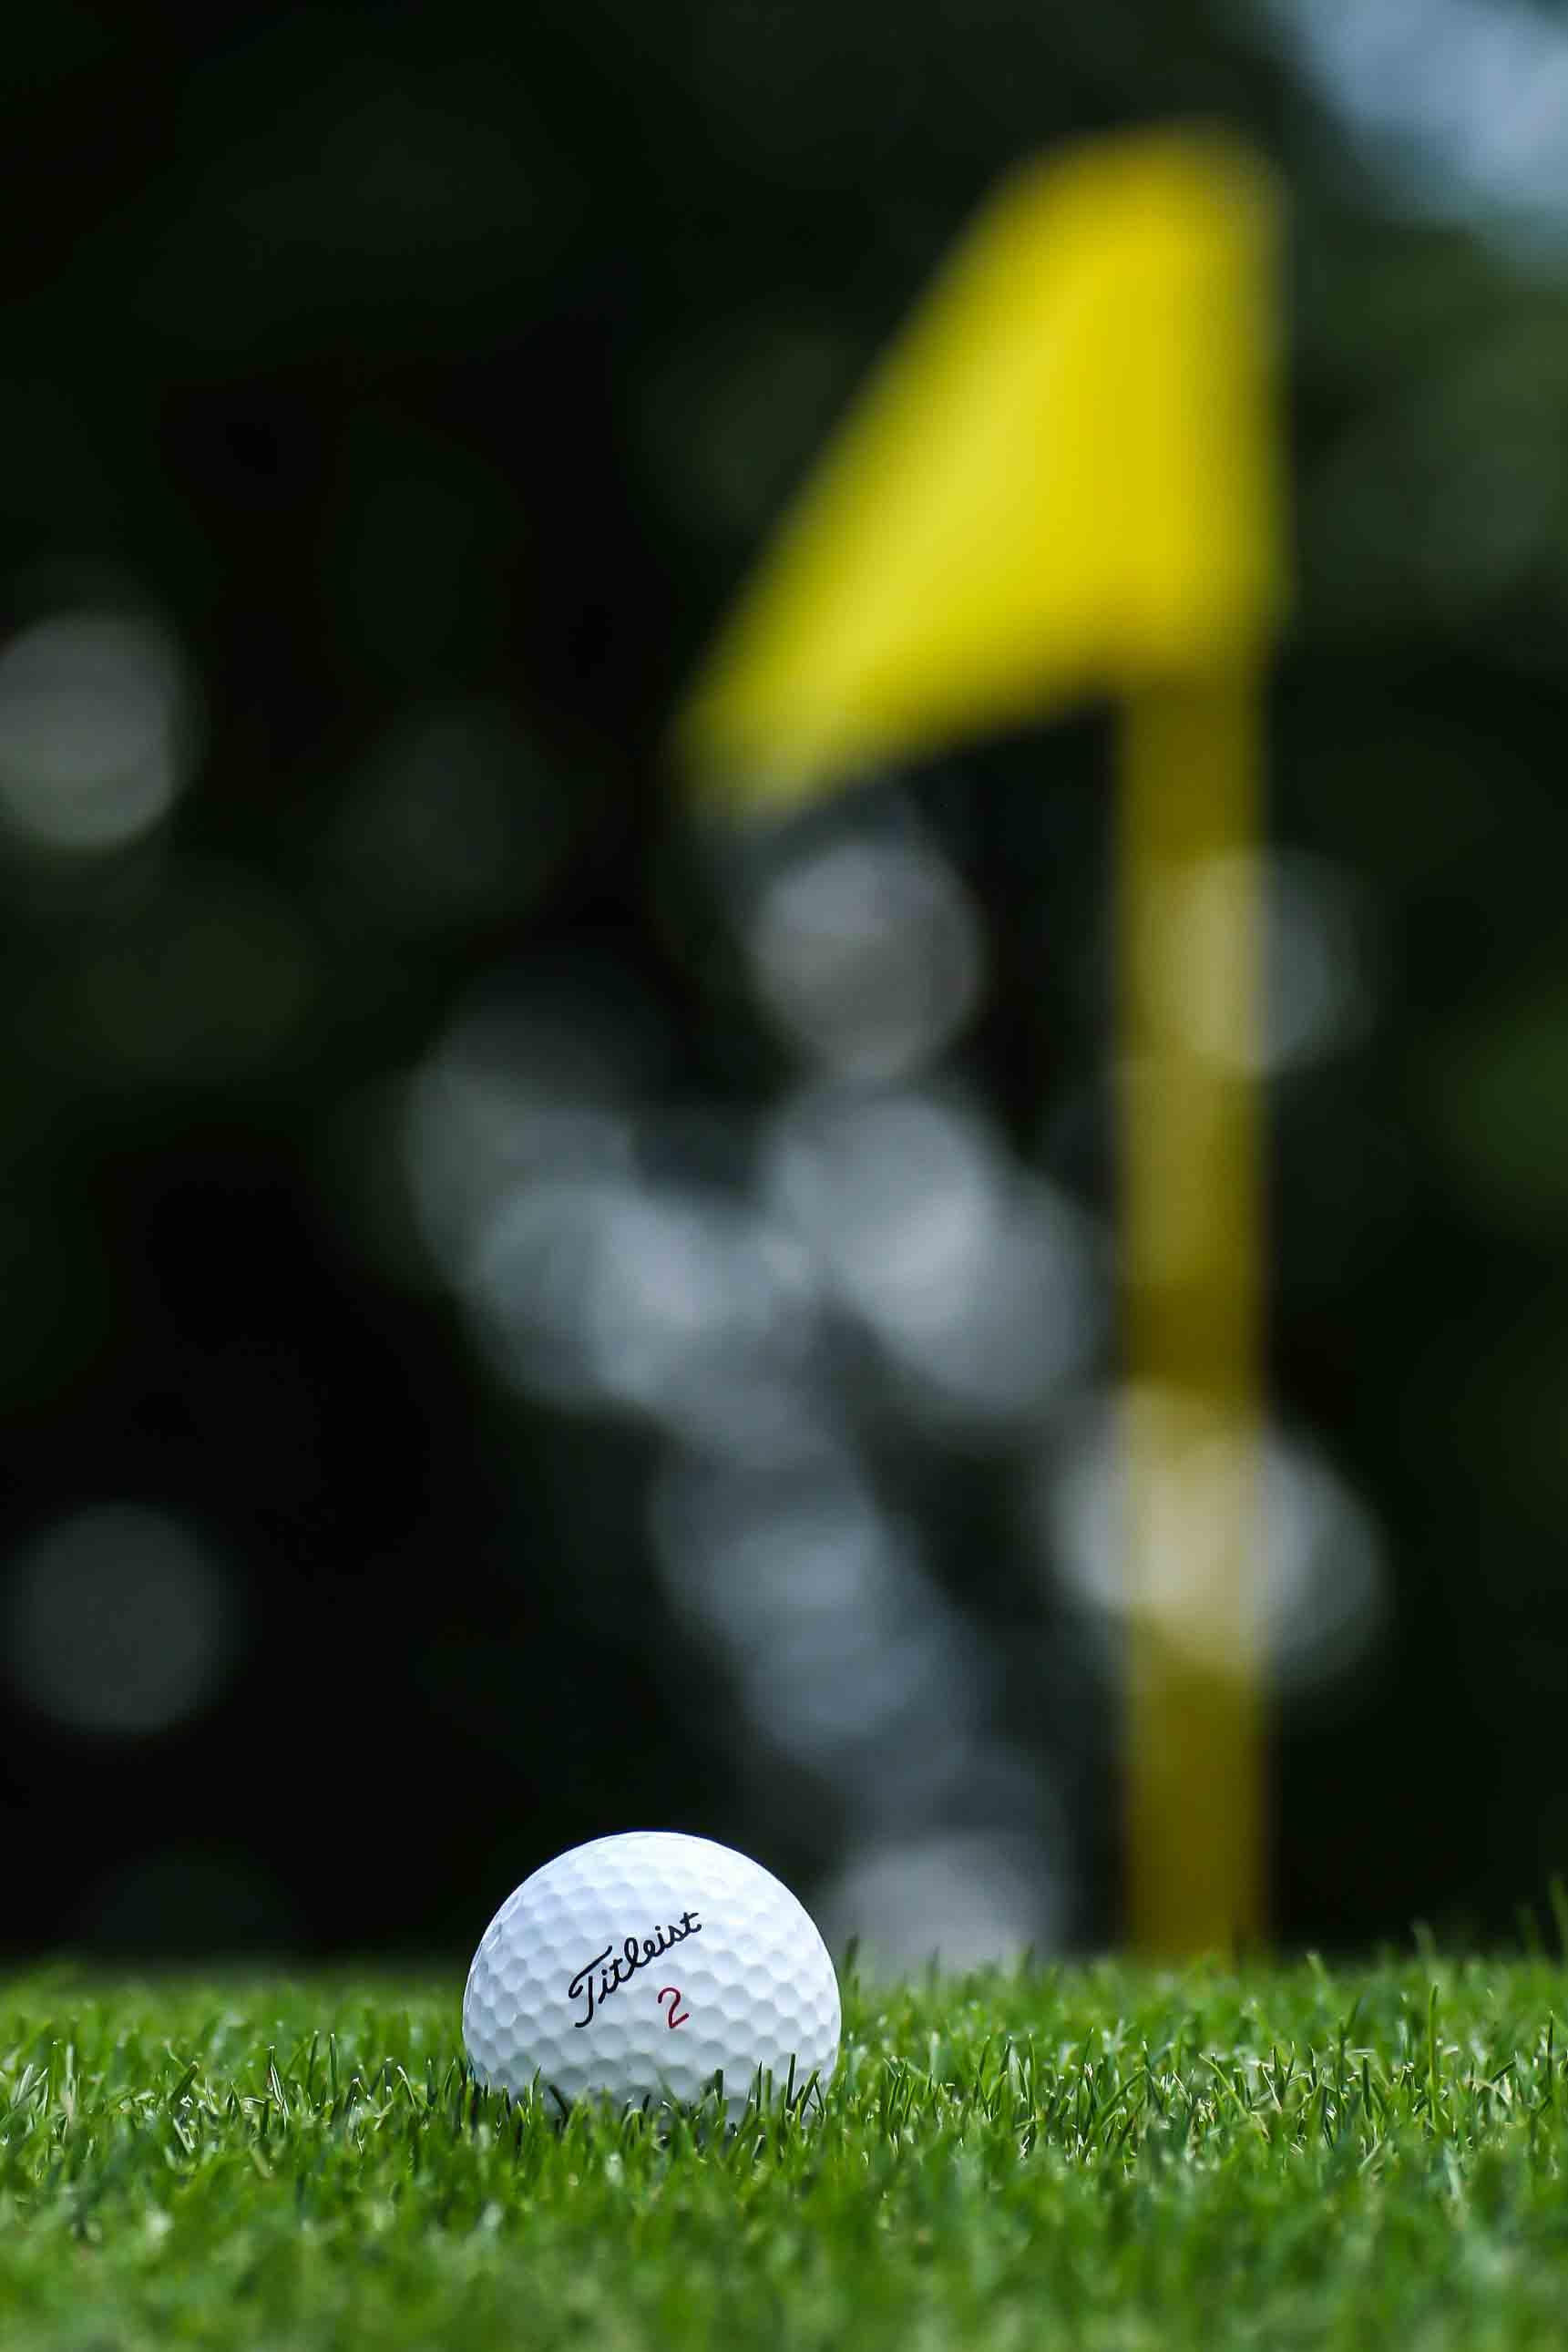 GolfBall2015-Small-1.jpg